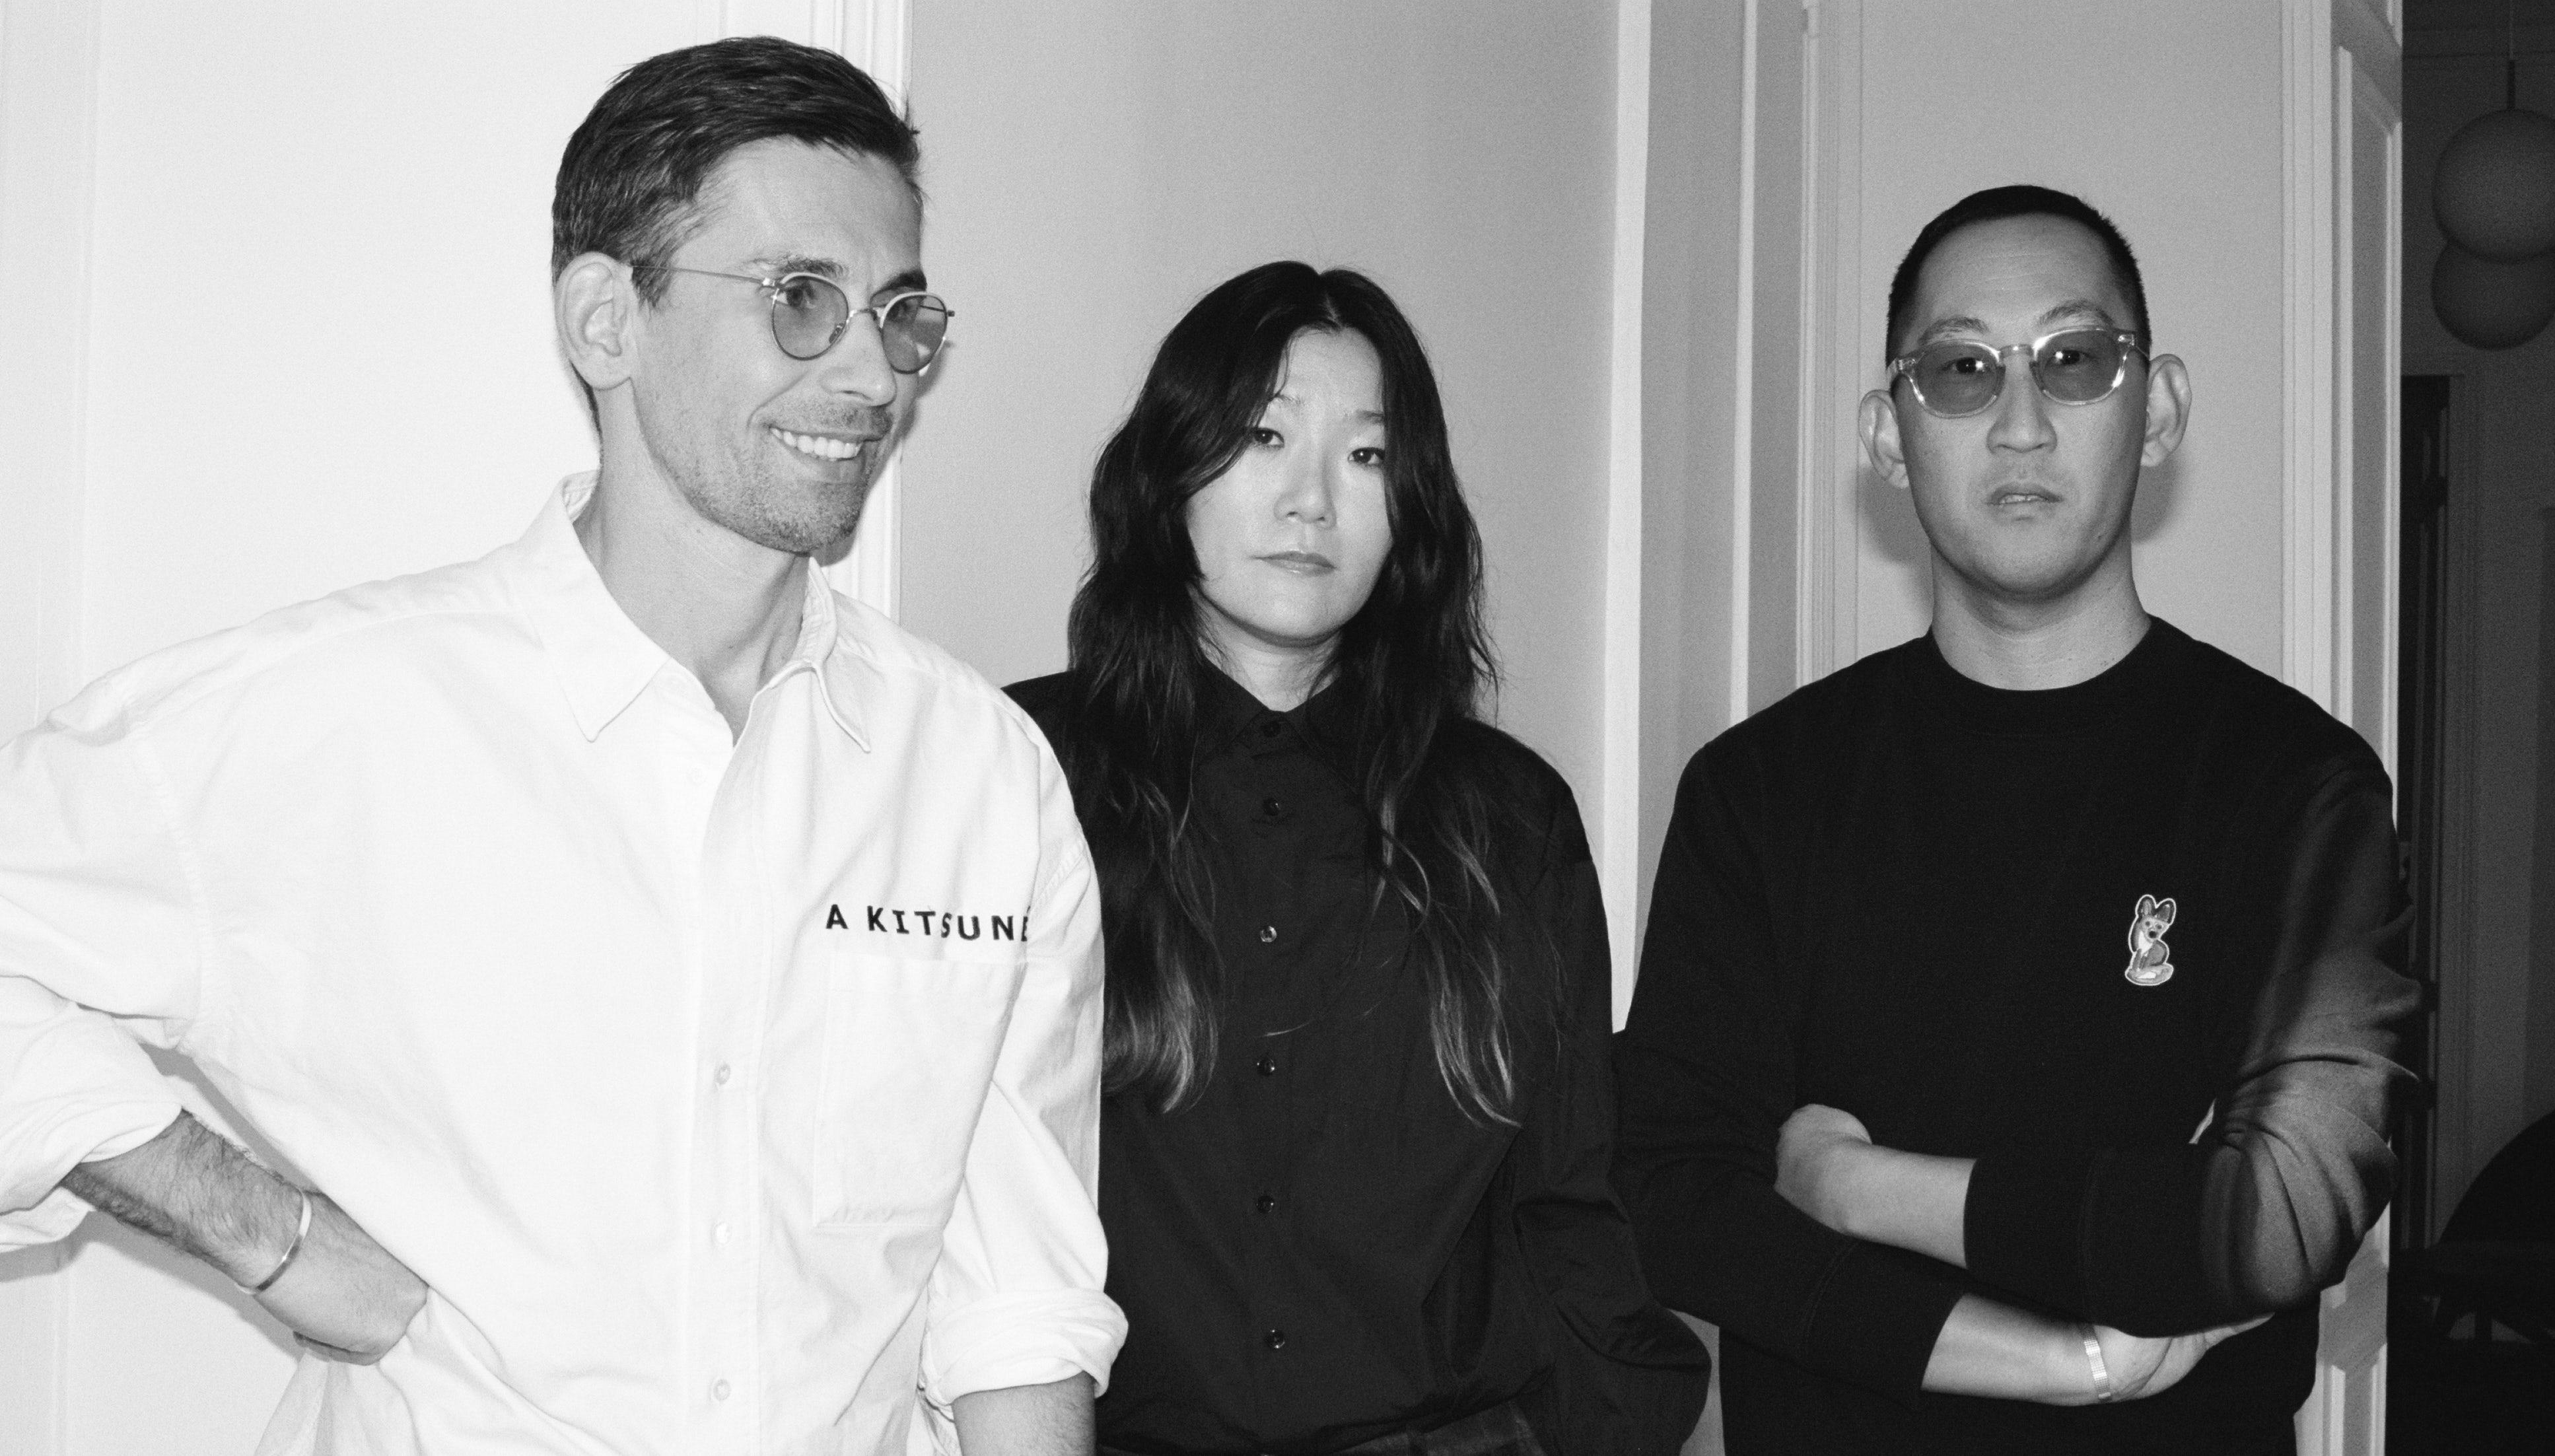 Left to right: Gildas Loaëc, Yuni Ahn, Masaya Kuroki | Photo: Kevin Buitrago